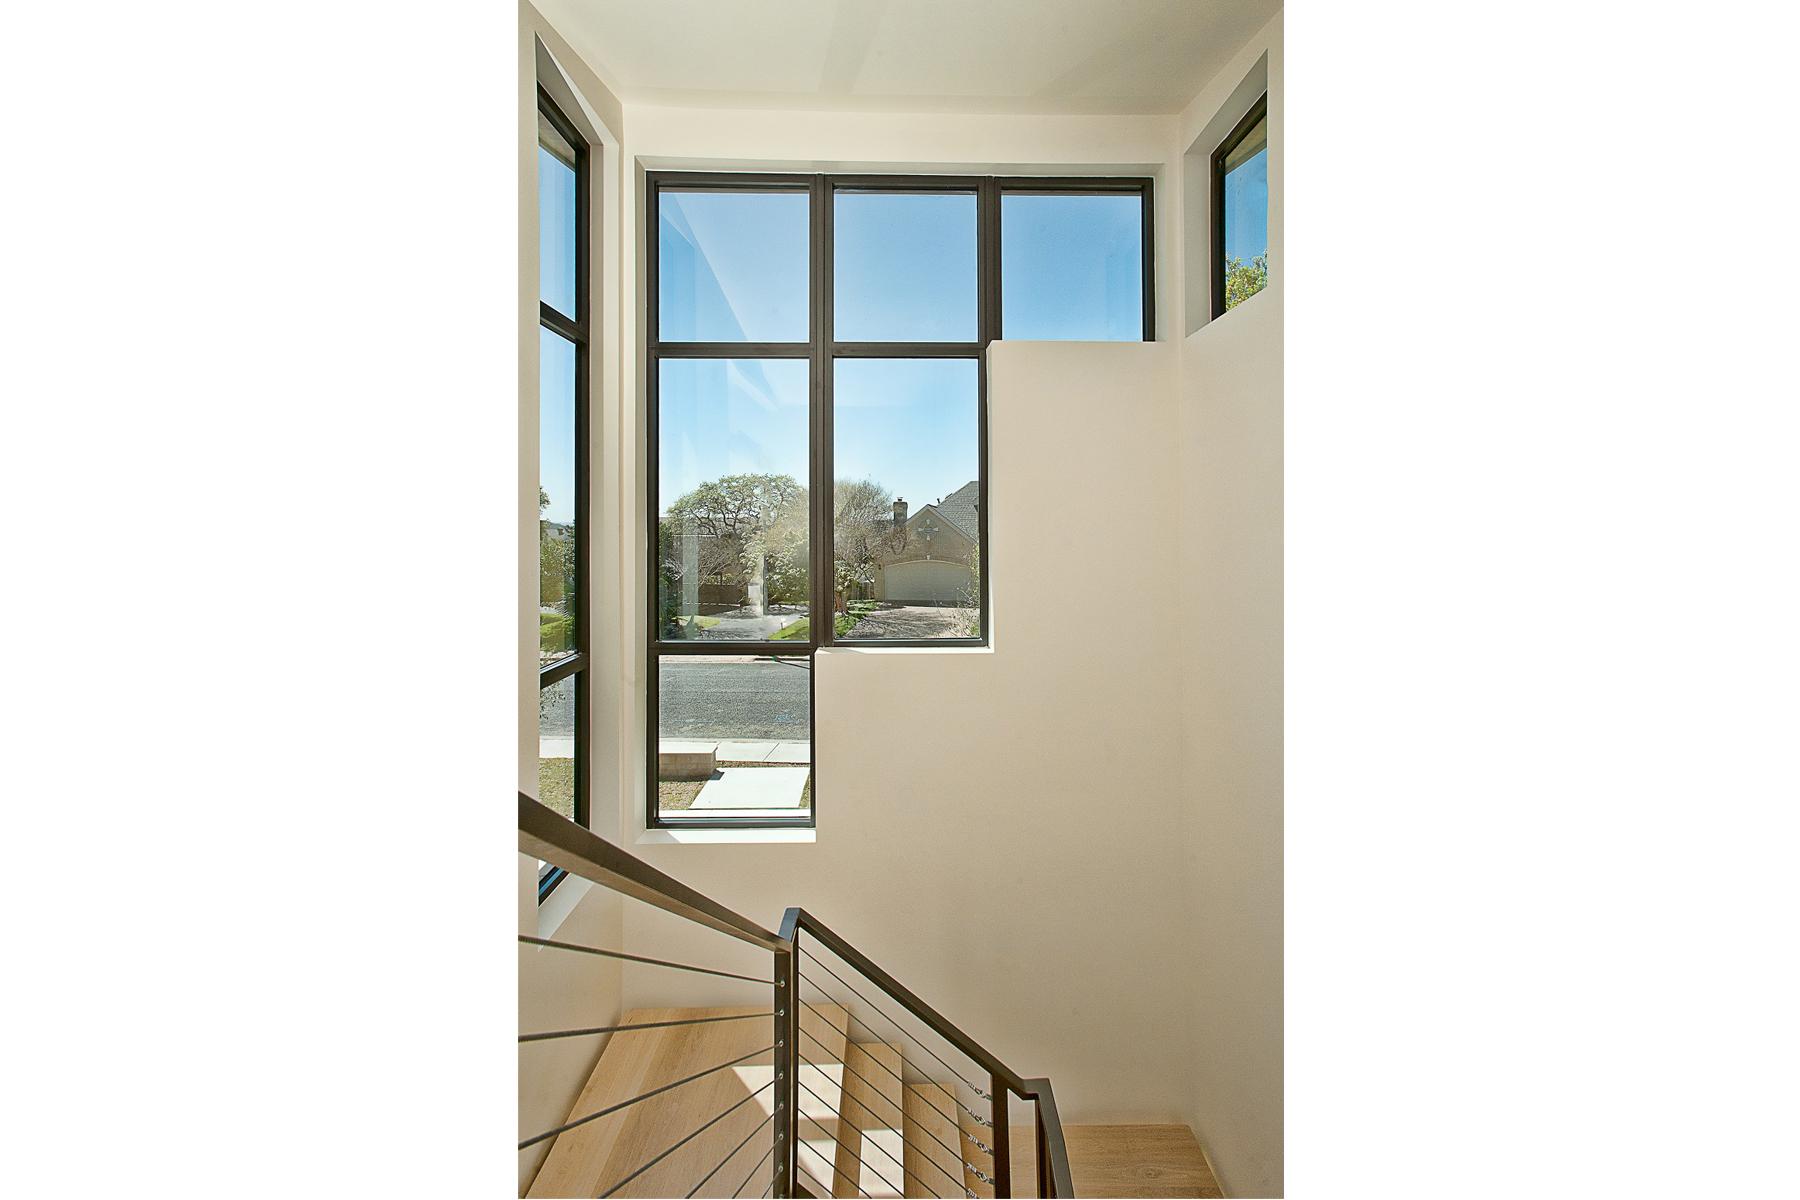 CatMountain-stairs-windows